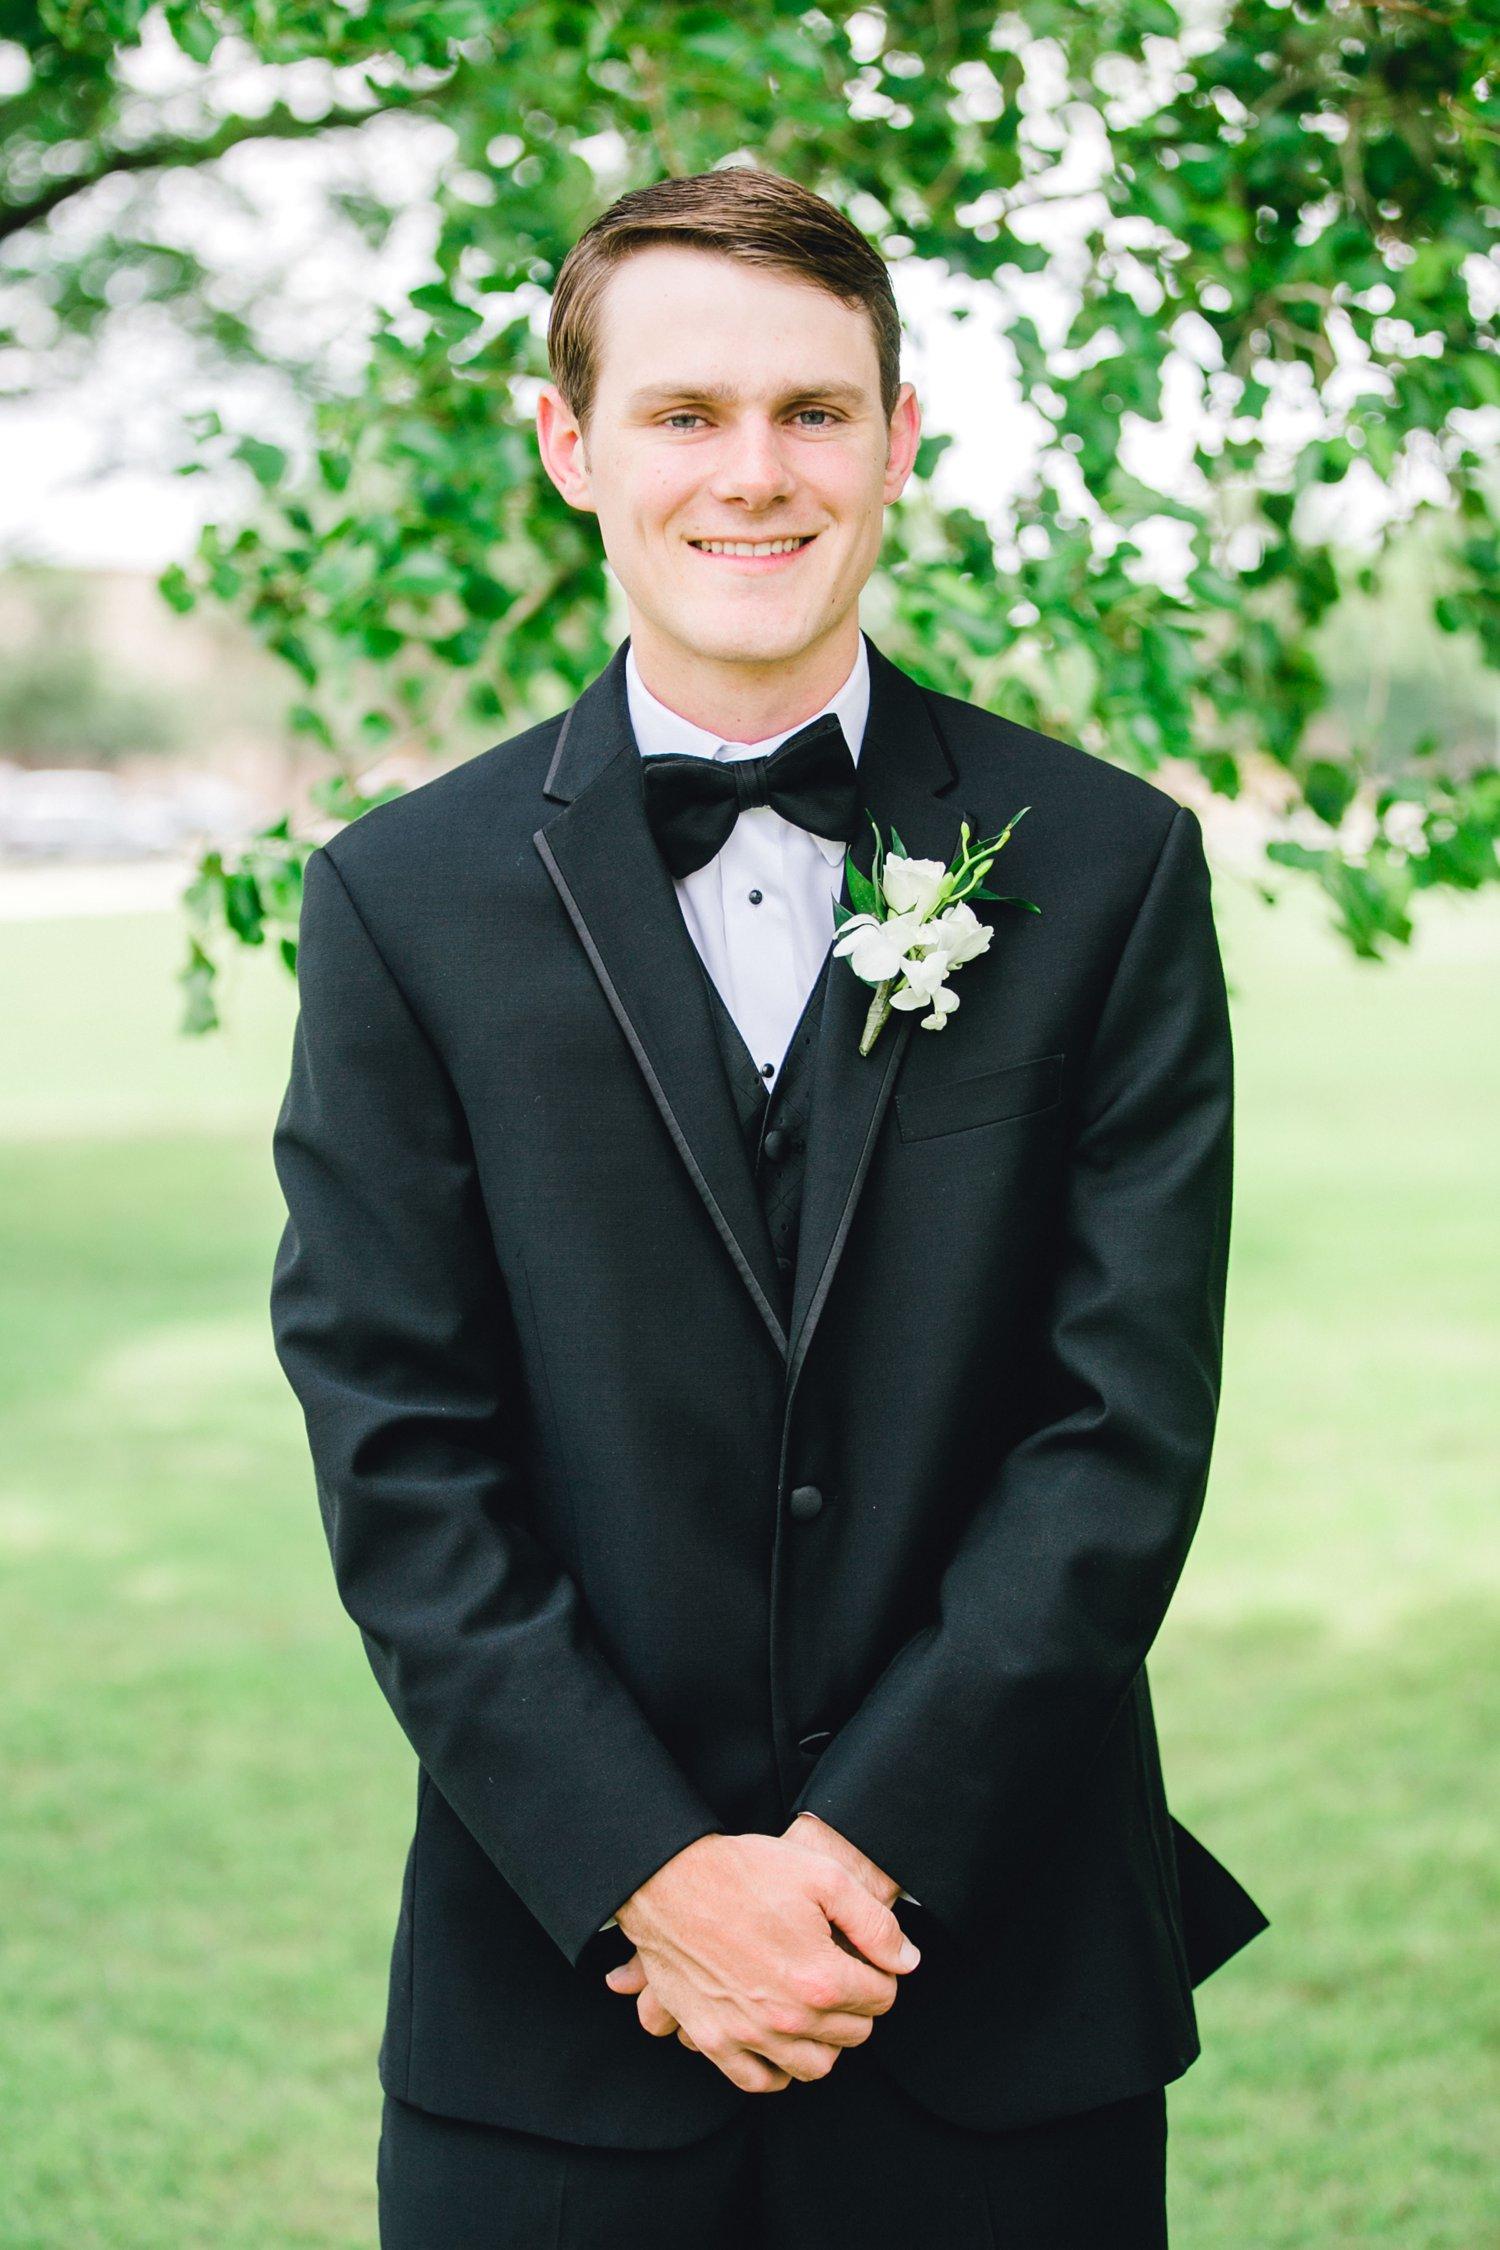 Taylor-and-Brock-Williams-Texas-Tech-University-Merket-Alumni-Center-Lubbock-Photographer-ALLEEJ0039.jpg